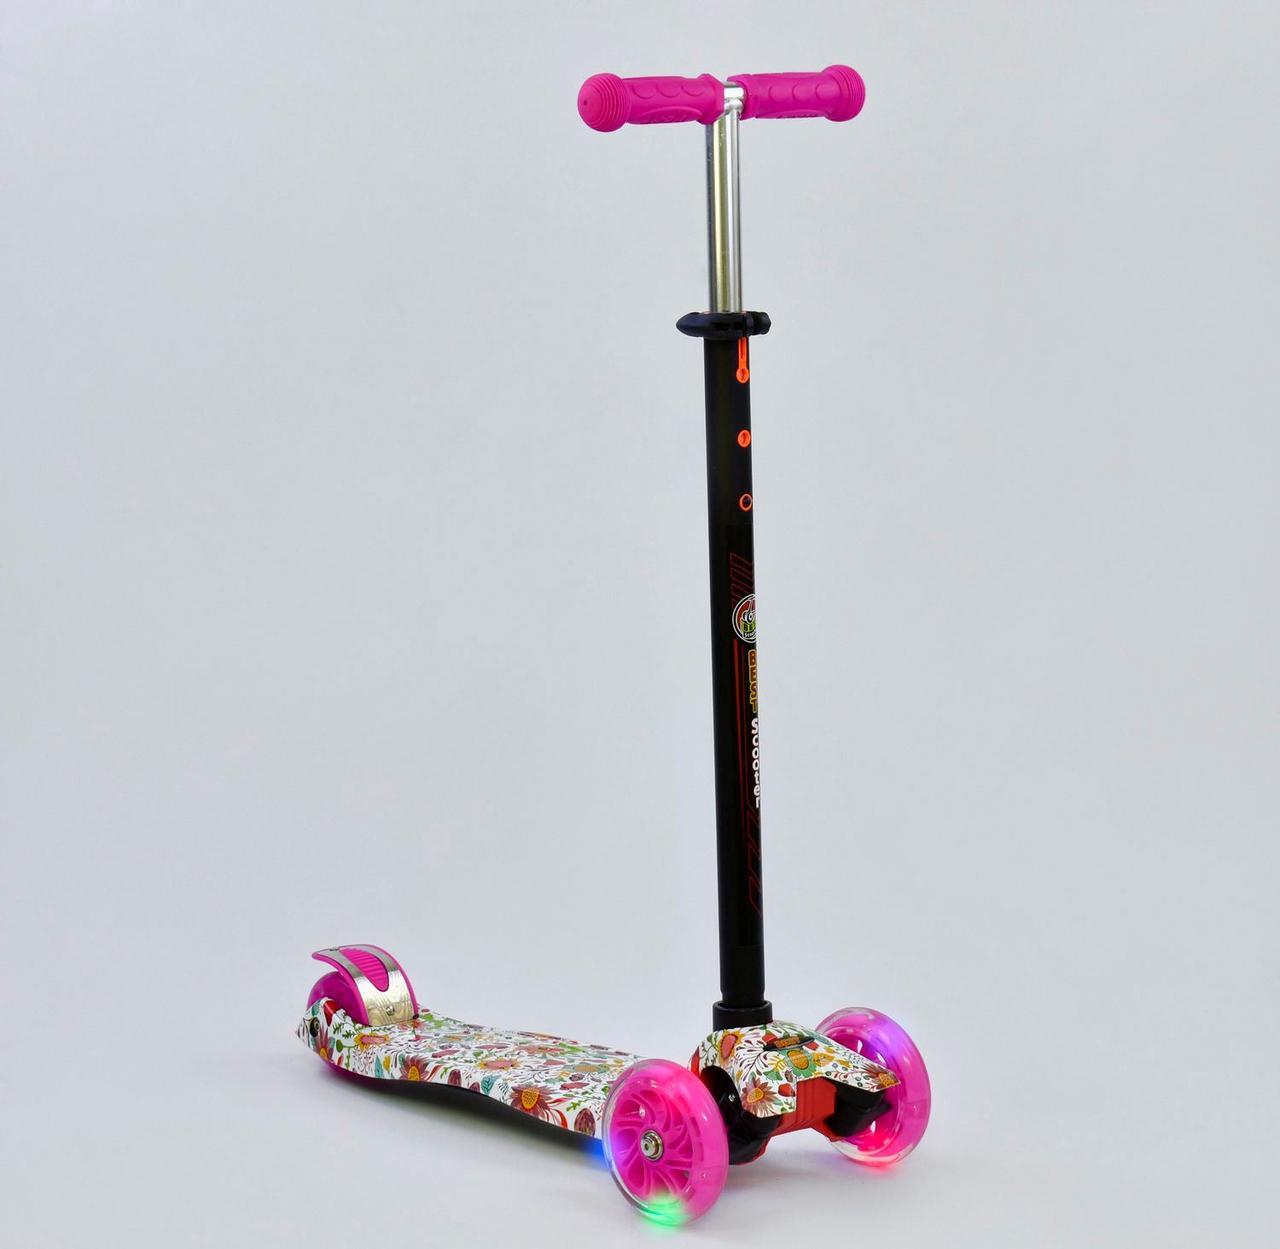 Самокат Best Scooter А 25466 /779-1321 Maxi розовый 74301